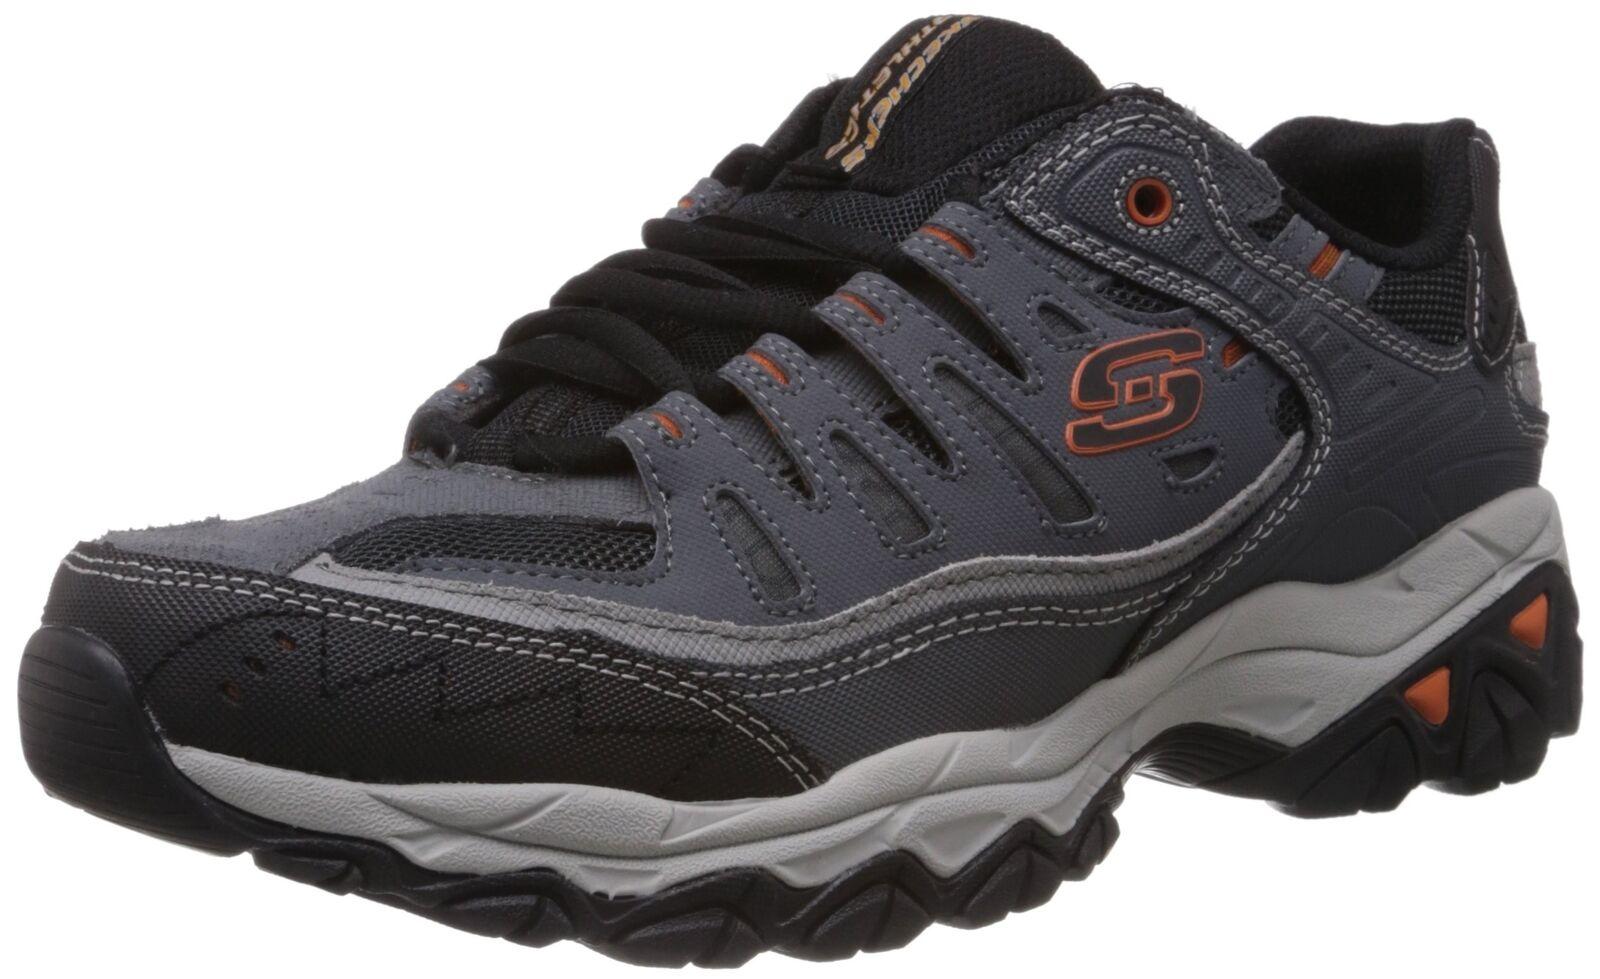 Skegers Sport Men's  Afterburn Memory Foam Lace -up scarpe da ginnastica Charcoal 13 4E US  ti aspetto